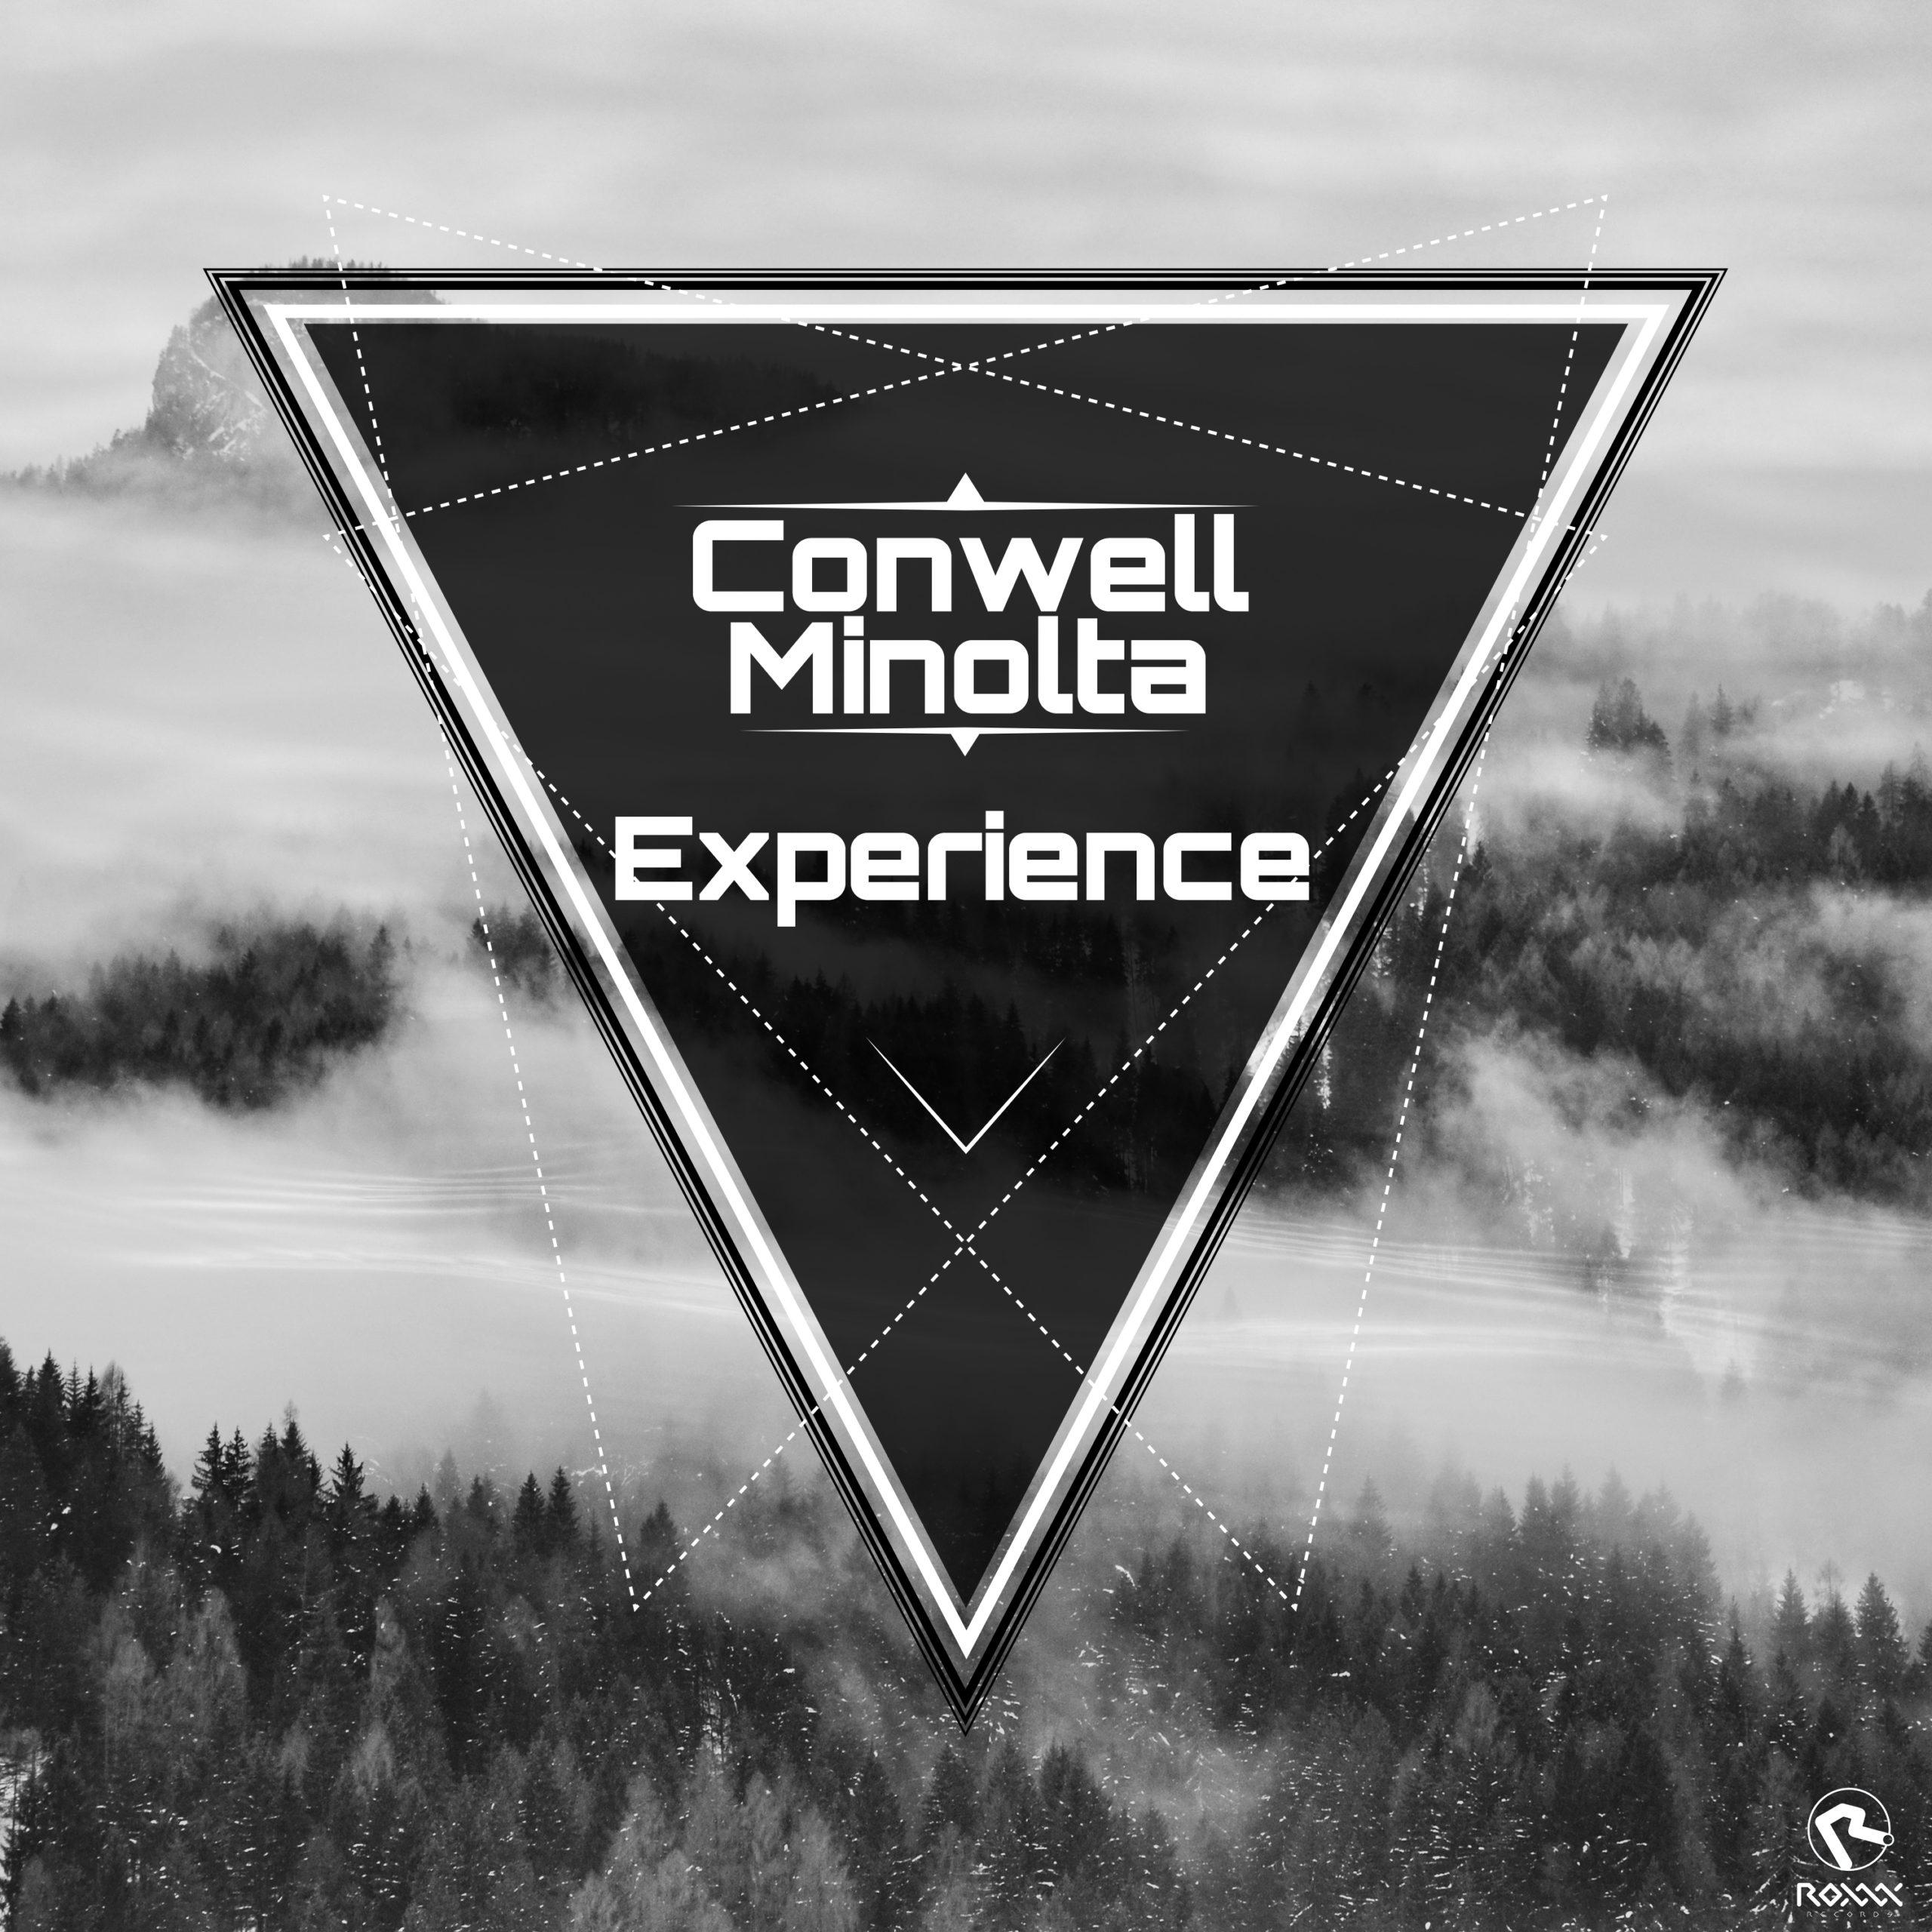 Experience - Conwell Minolta